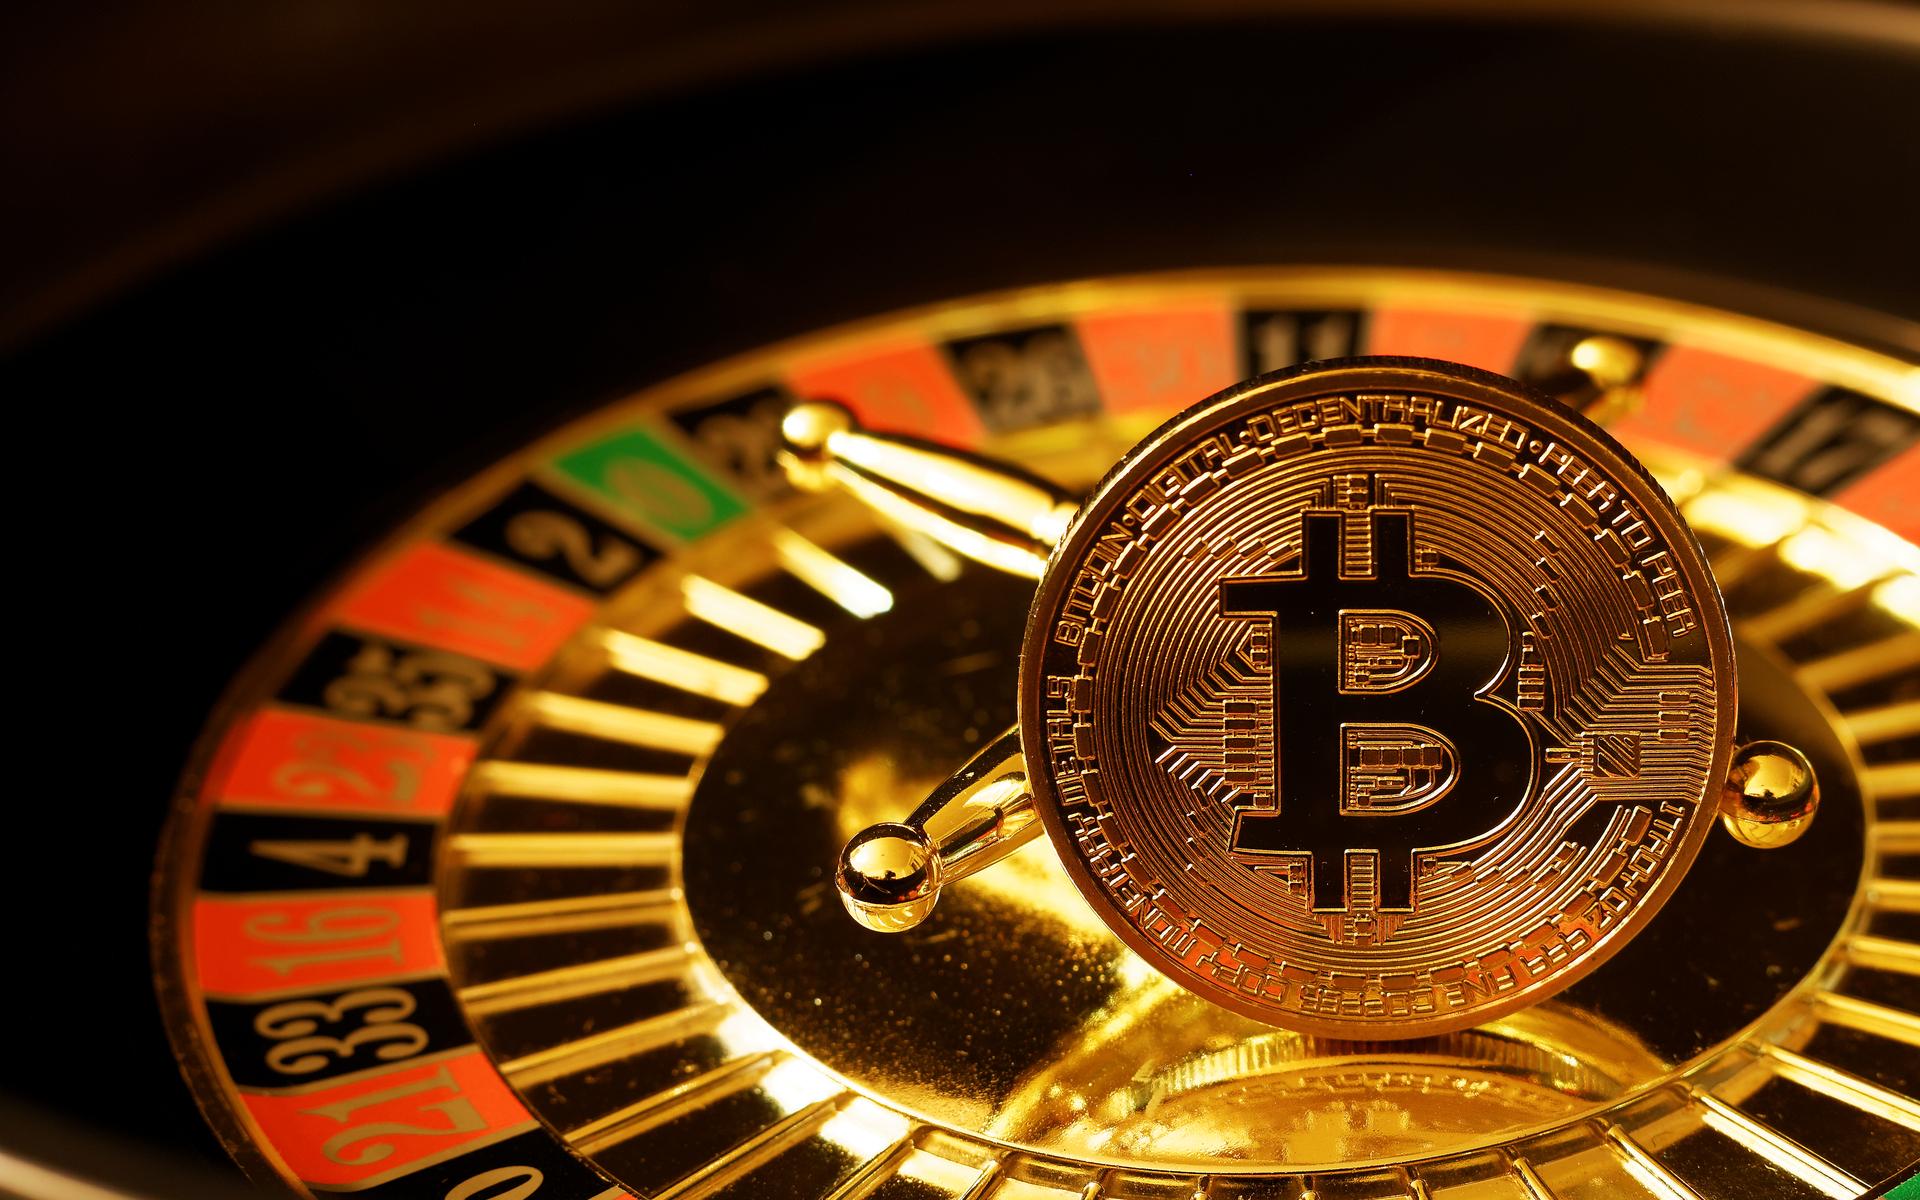 Economist Warns of 1929-Like Second Leg Down, Will Bitcoin Follow?